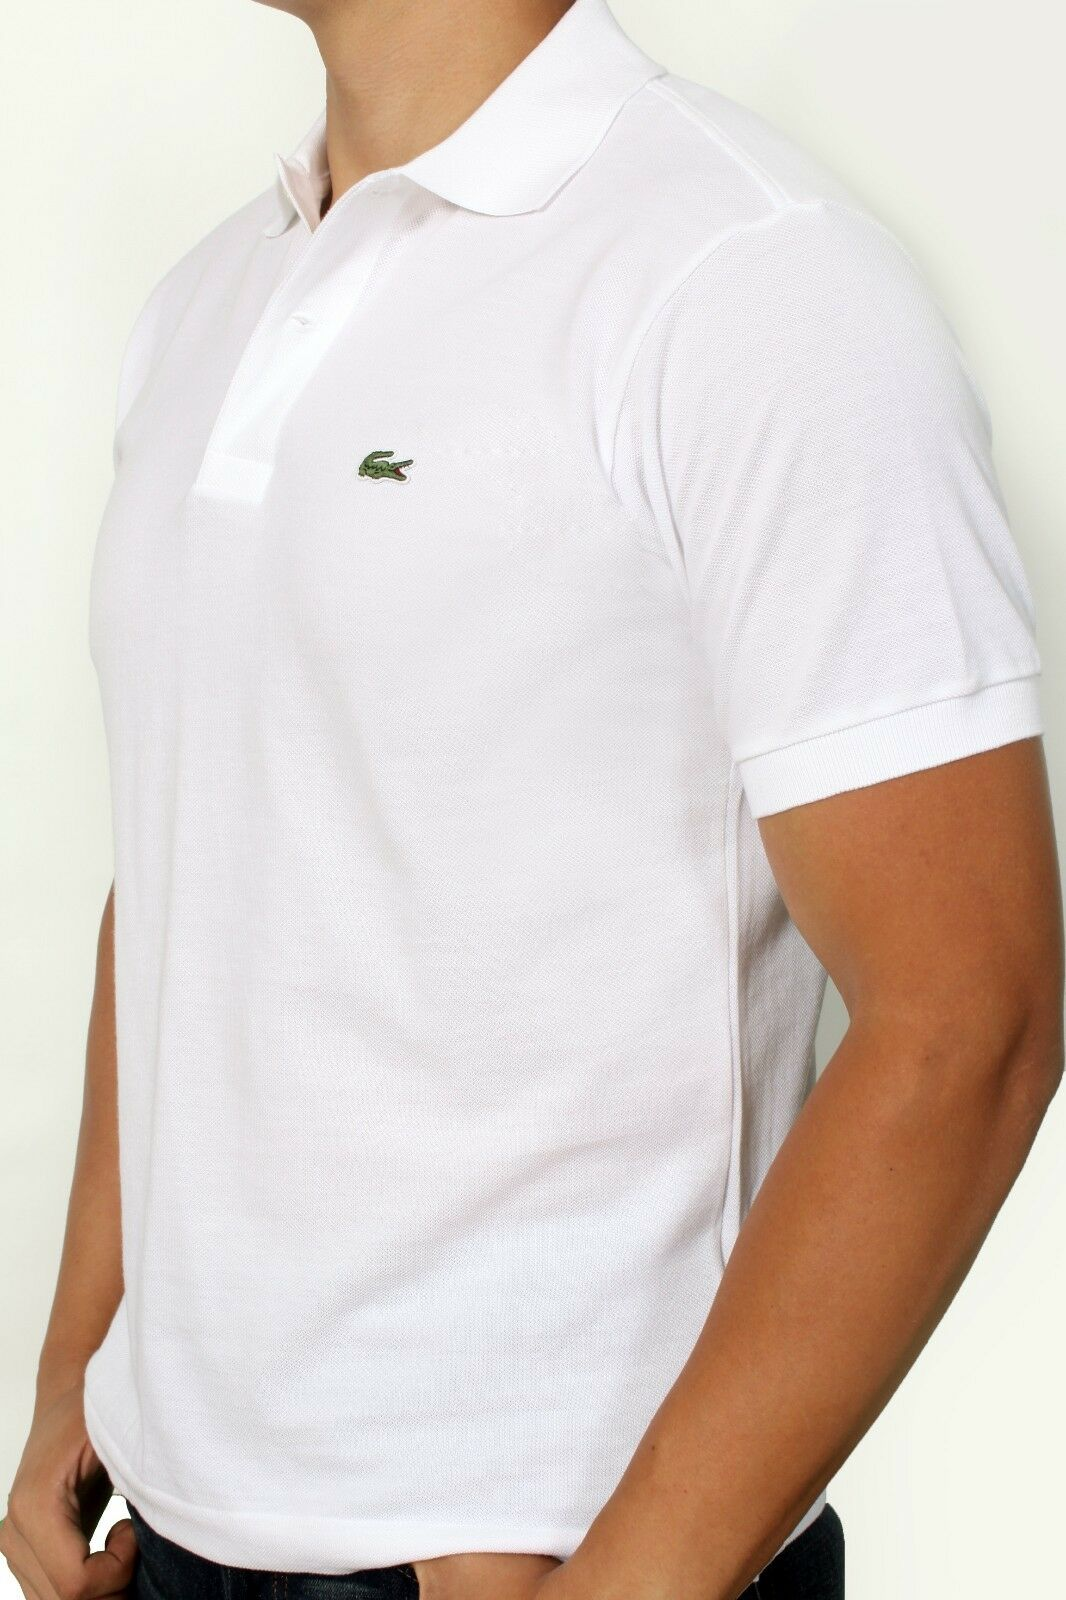 Lacoste Men/'s L!VE Short Sleeve Multi Color Tipped Polo PH9194-51 PRB White